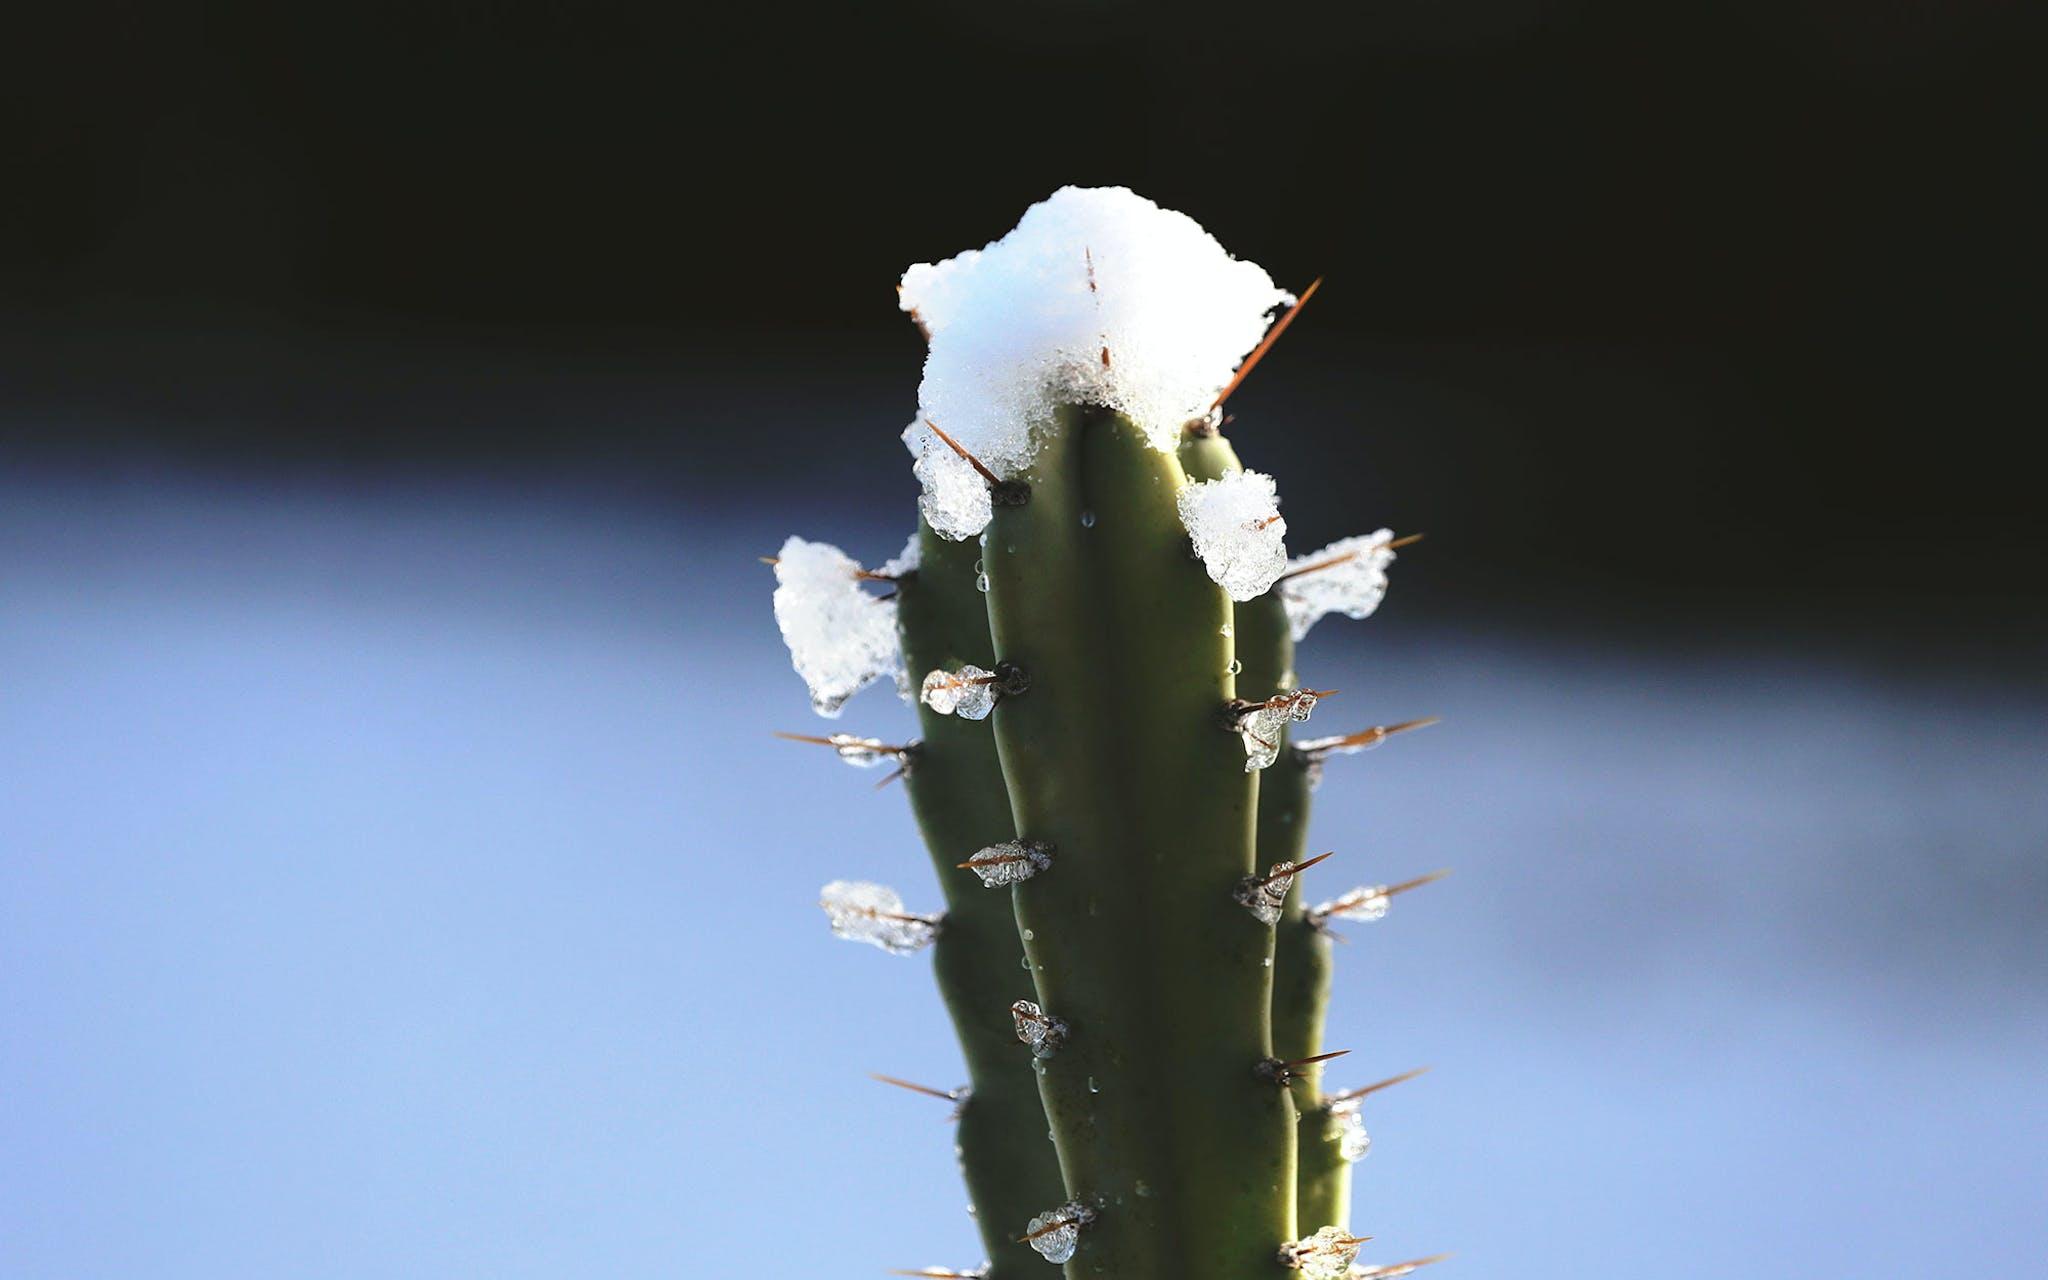 Snow on Cactus Texas